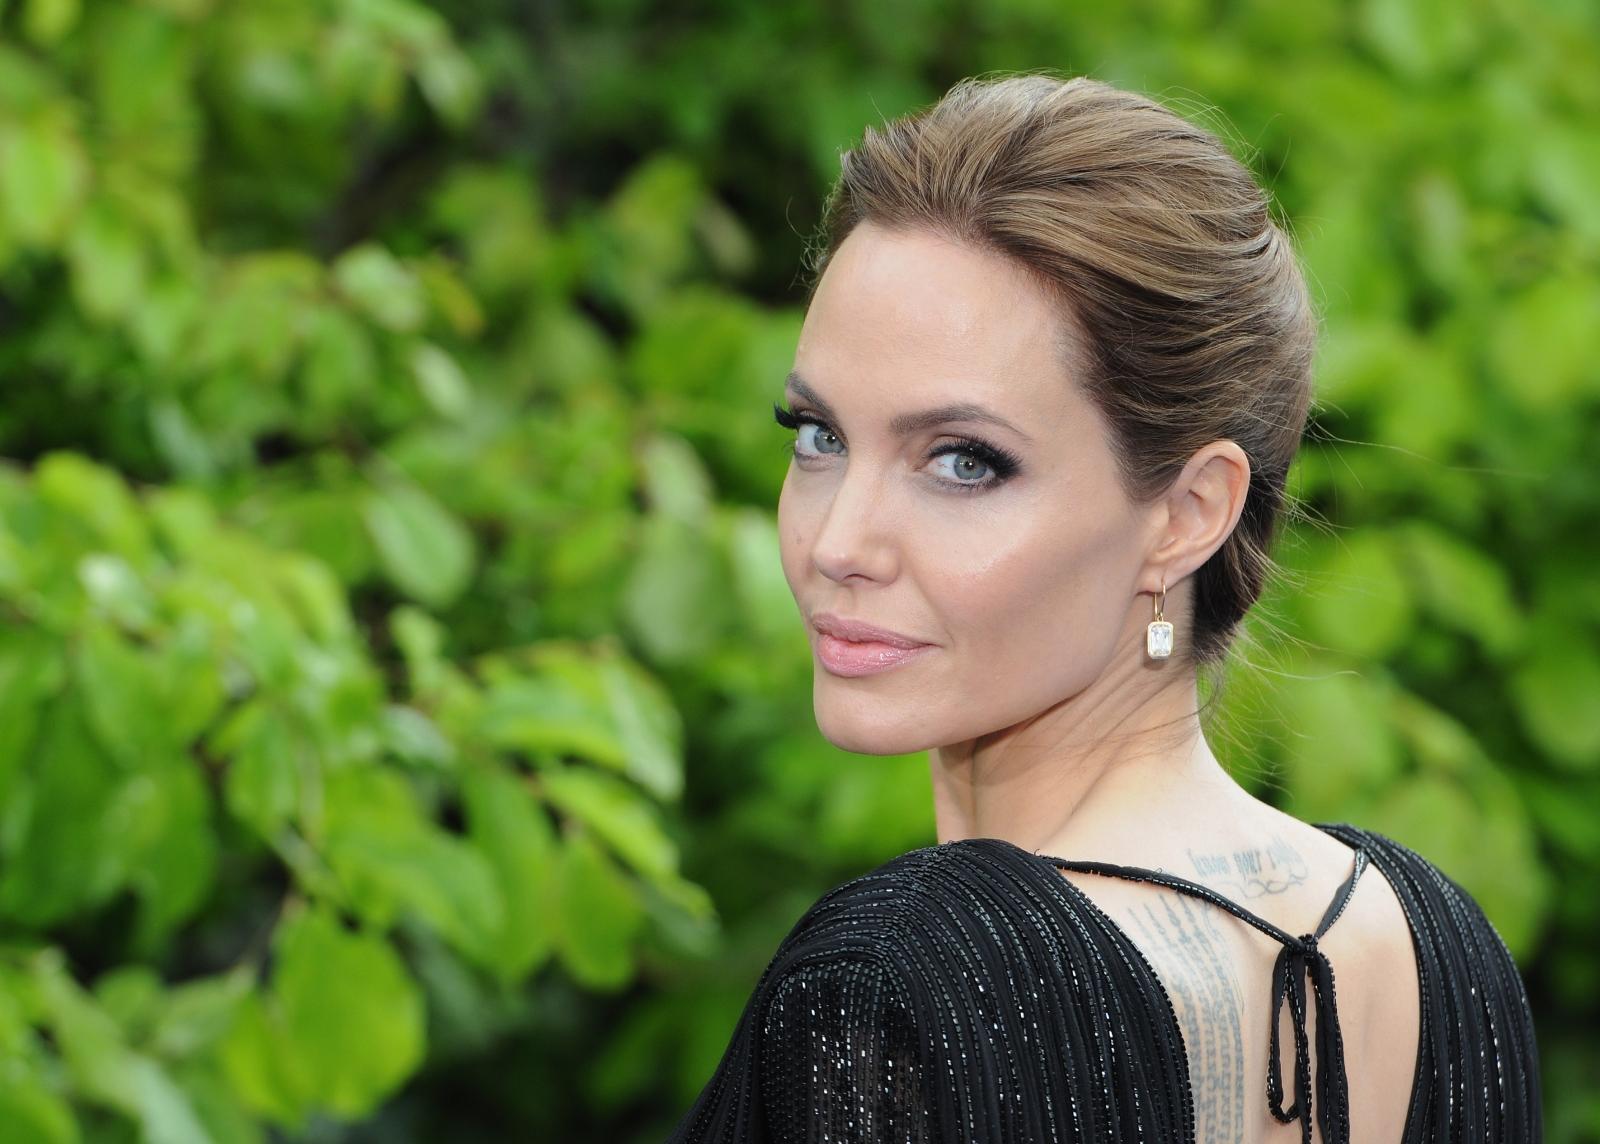 Angelina Jolie: Angelina Jolie Afraid Of Estranged Father Jon Voight